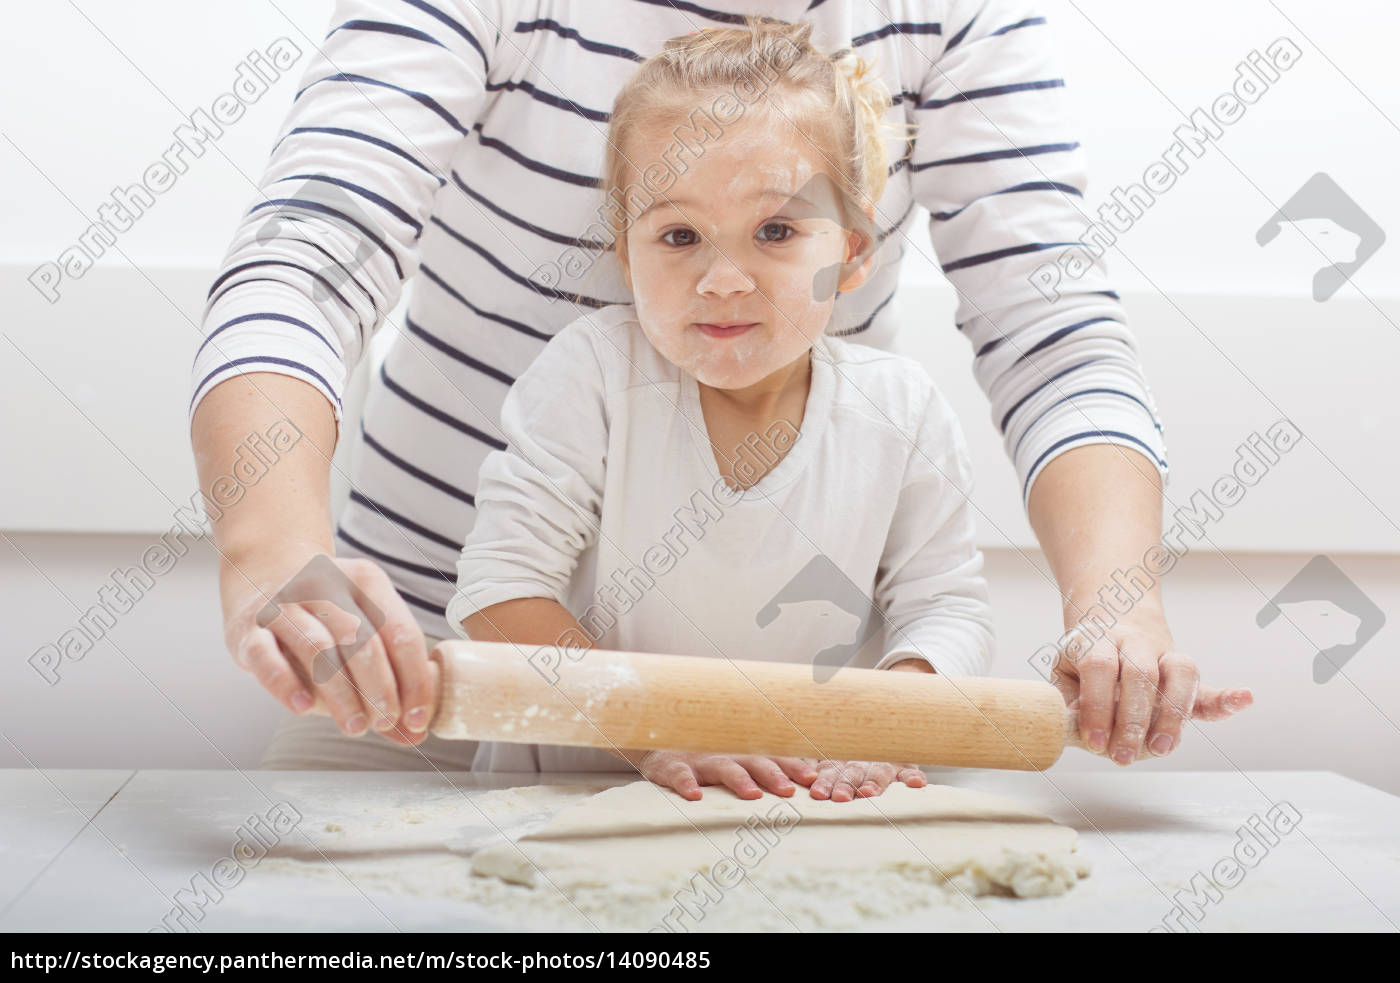 , teamwork, kneading, dough - 14090485